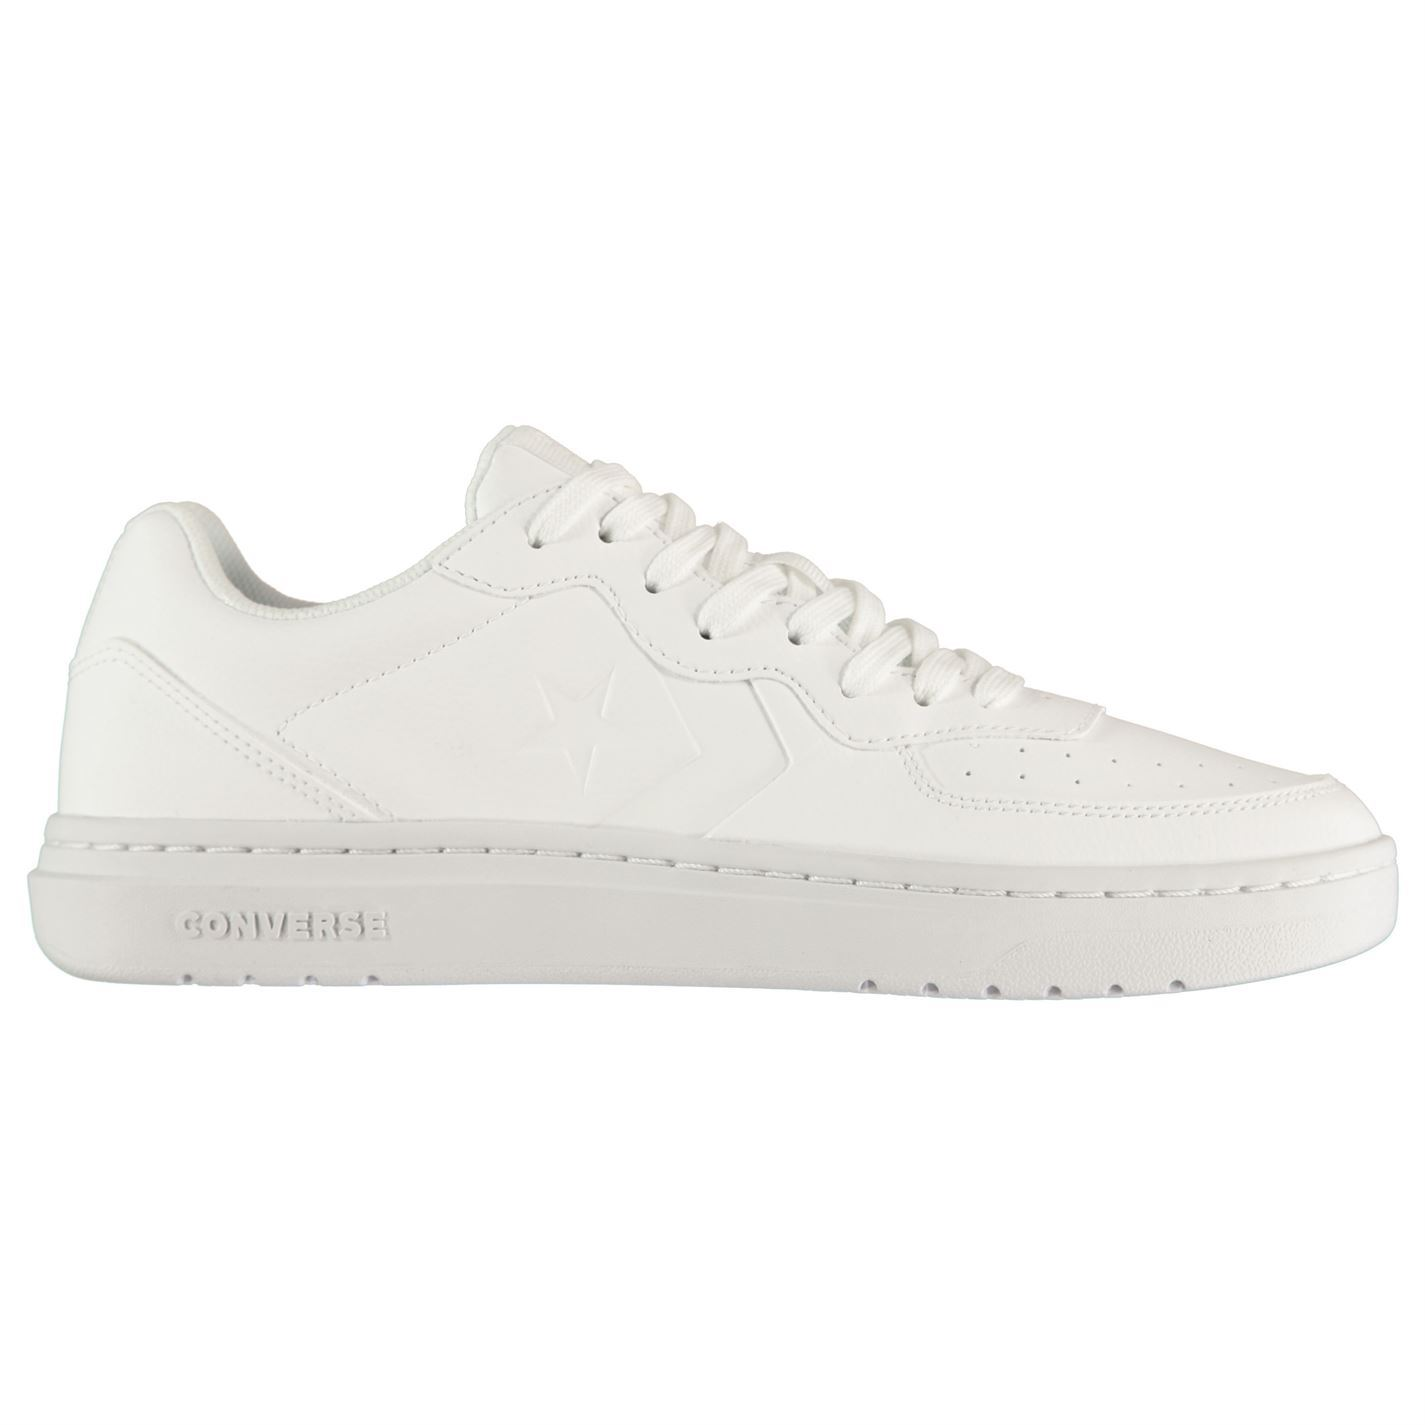 Converse-Ox-Rival-Cuir-Baskets-Pour-Homme-Chaussures-De-Loisirs-Chaussures-Baskets miniature 13